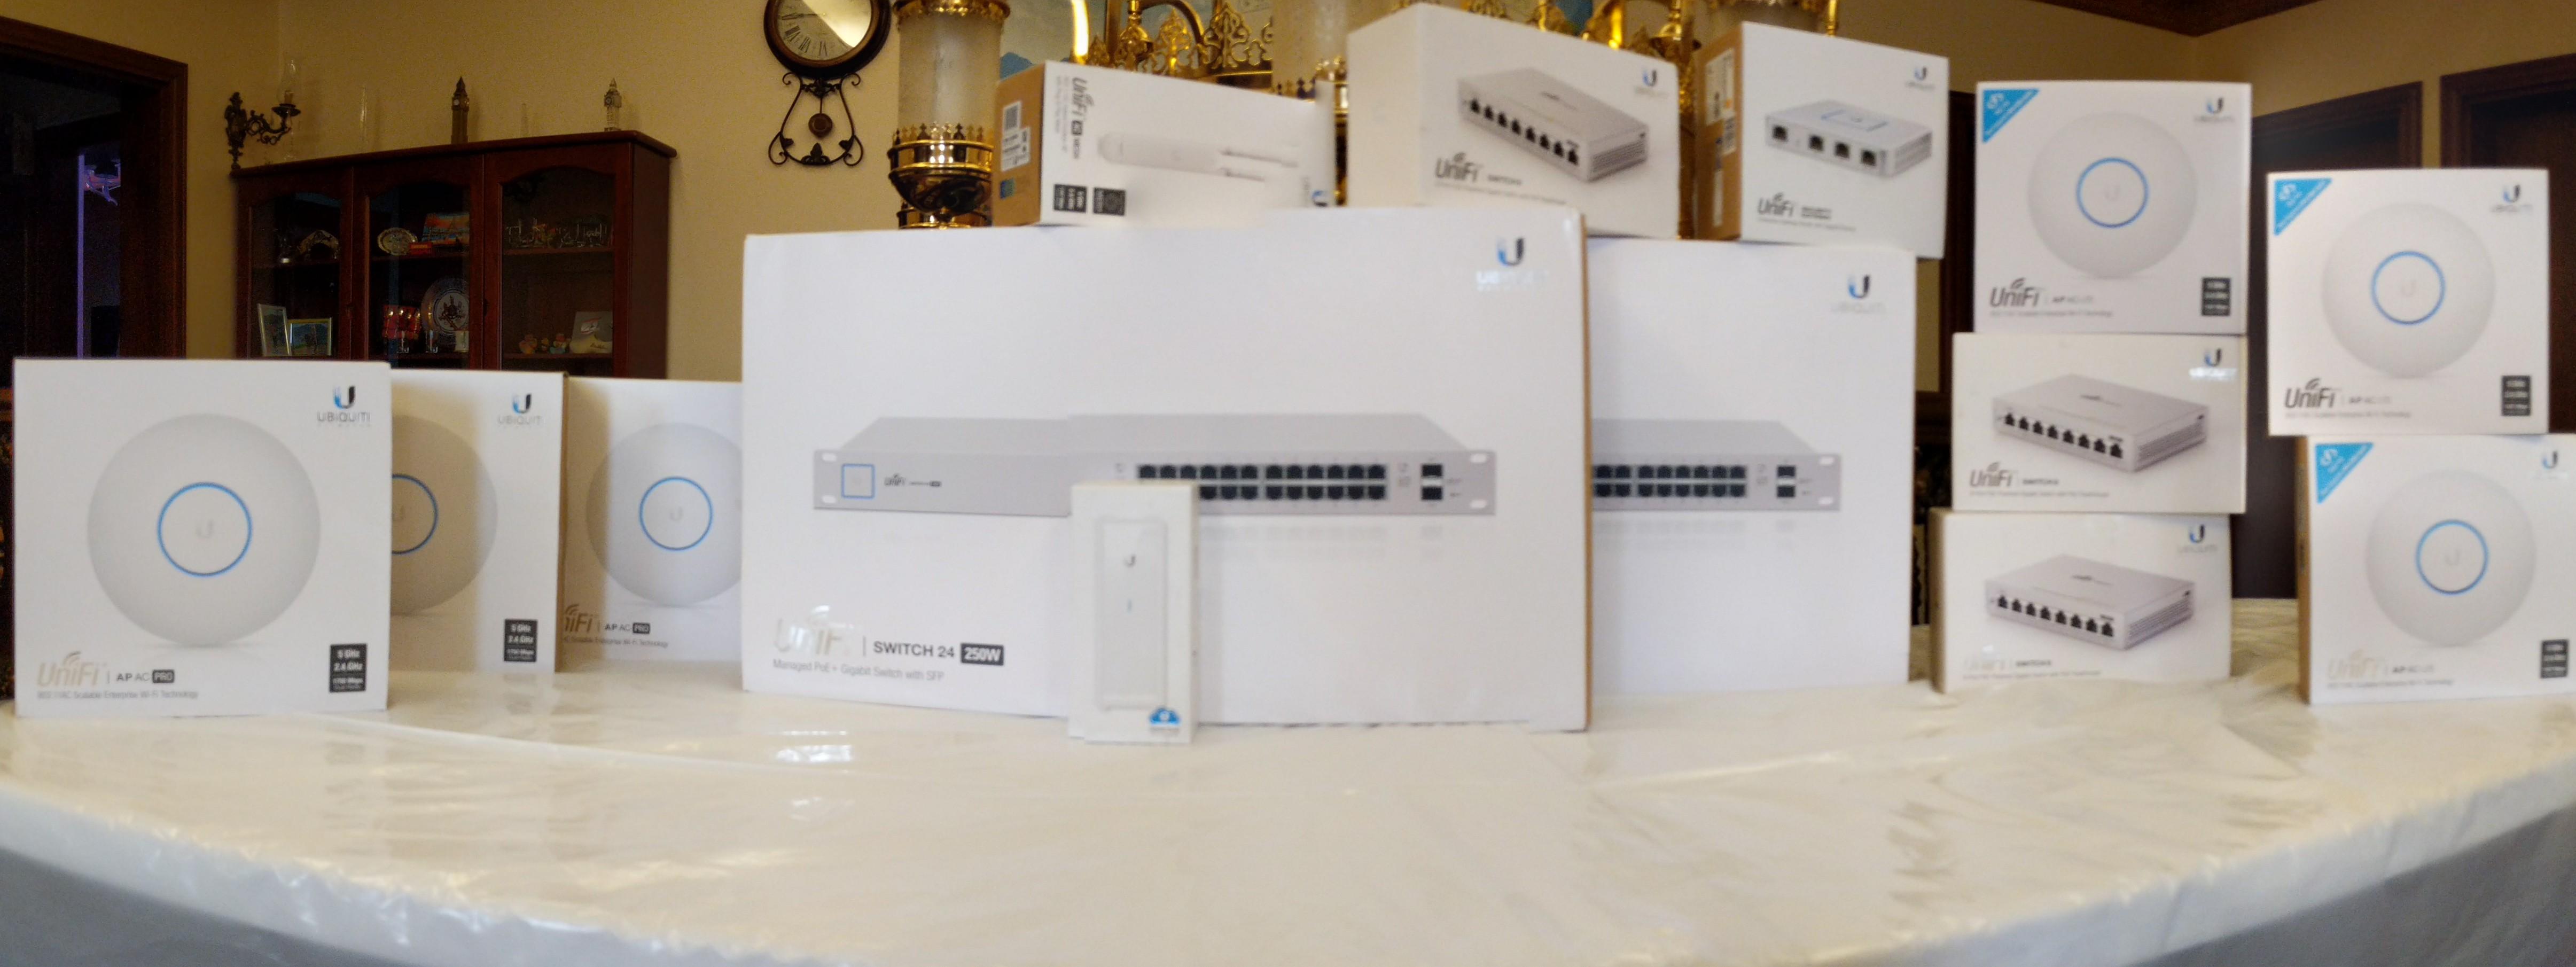 Saleh Blog » Computer and IT